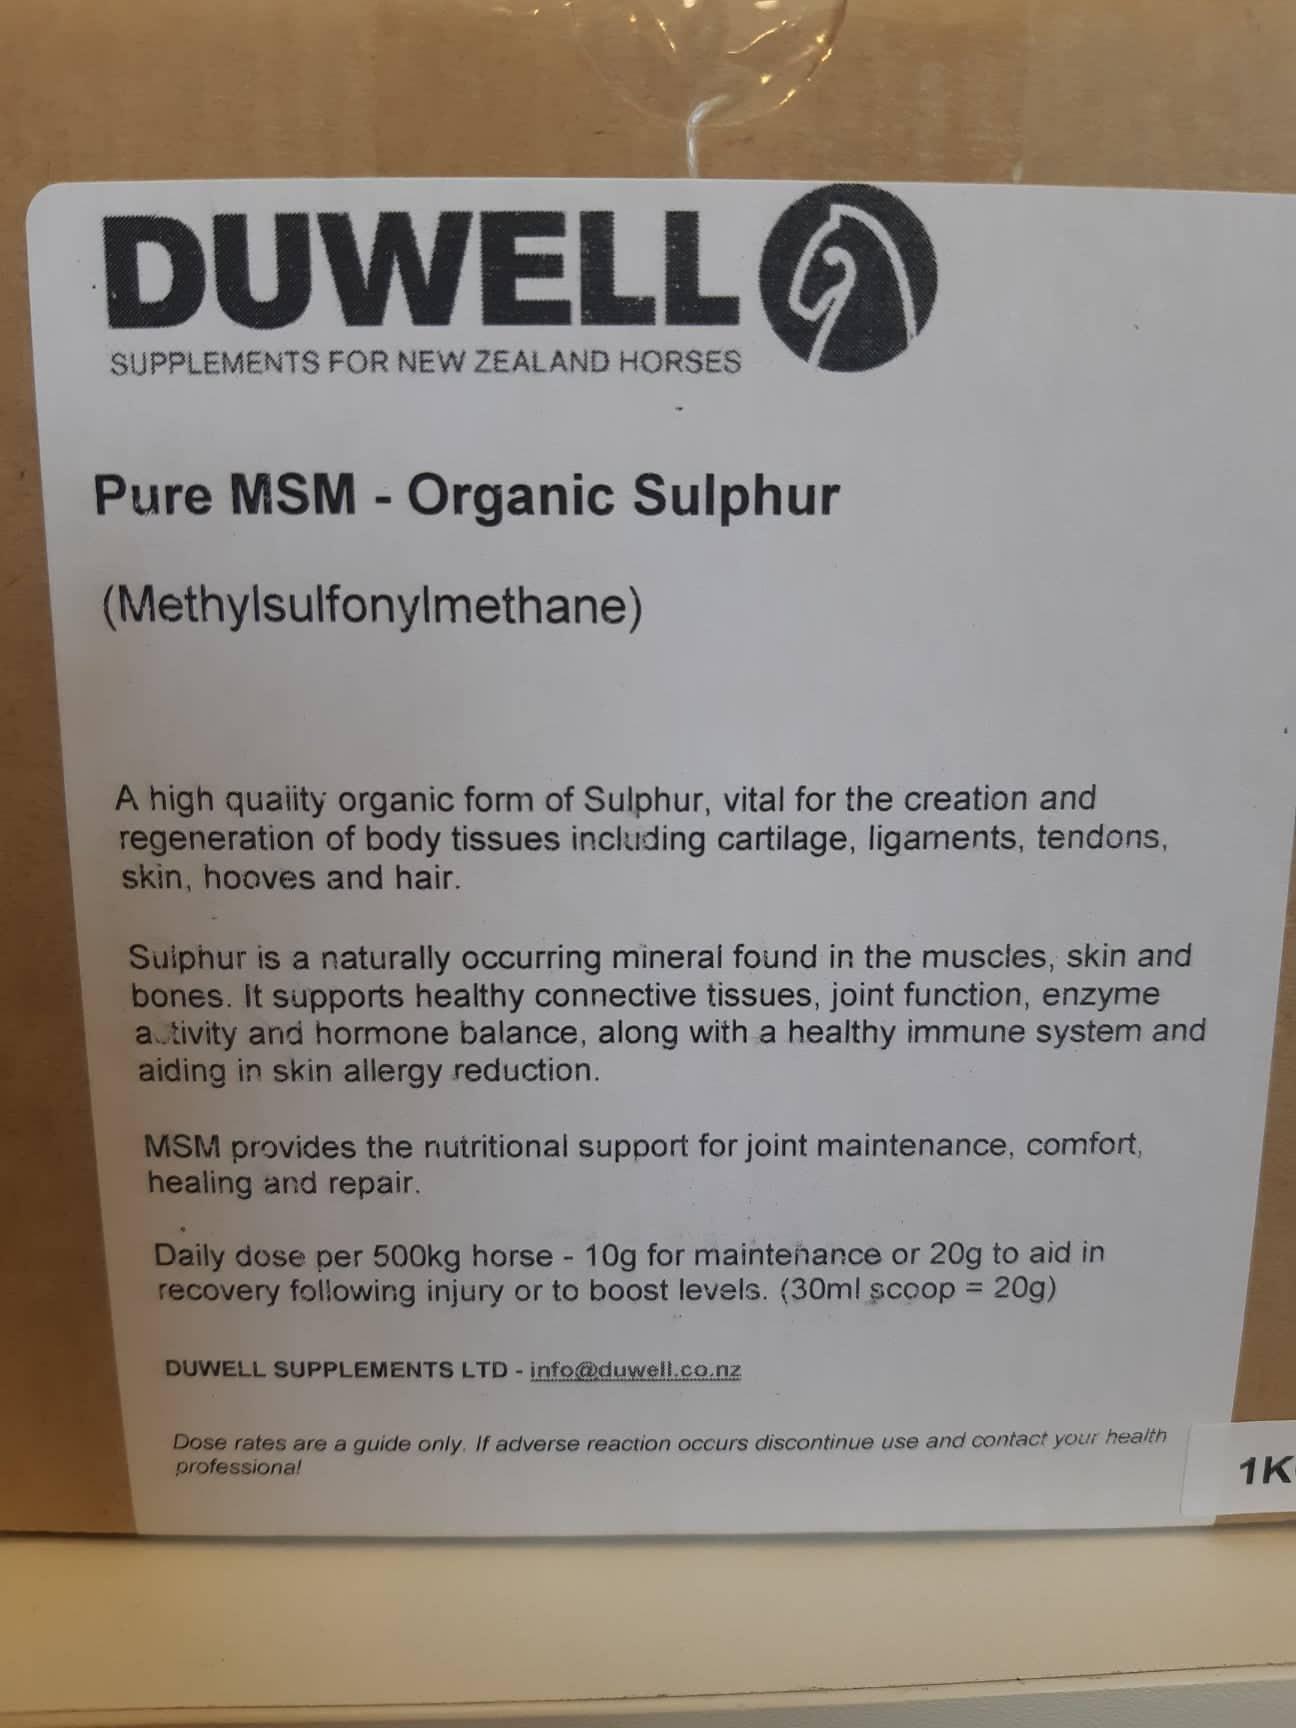 duwell pure msm